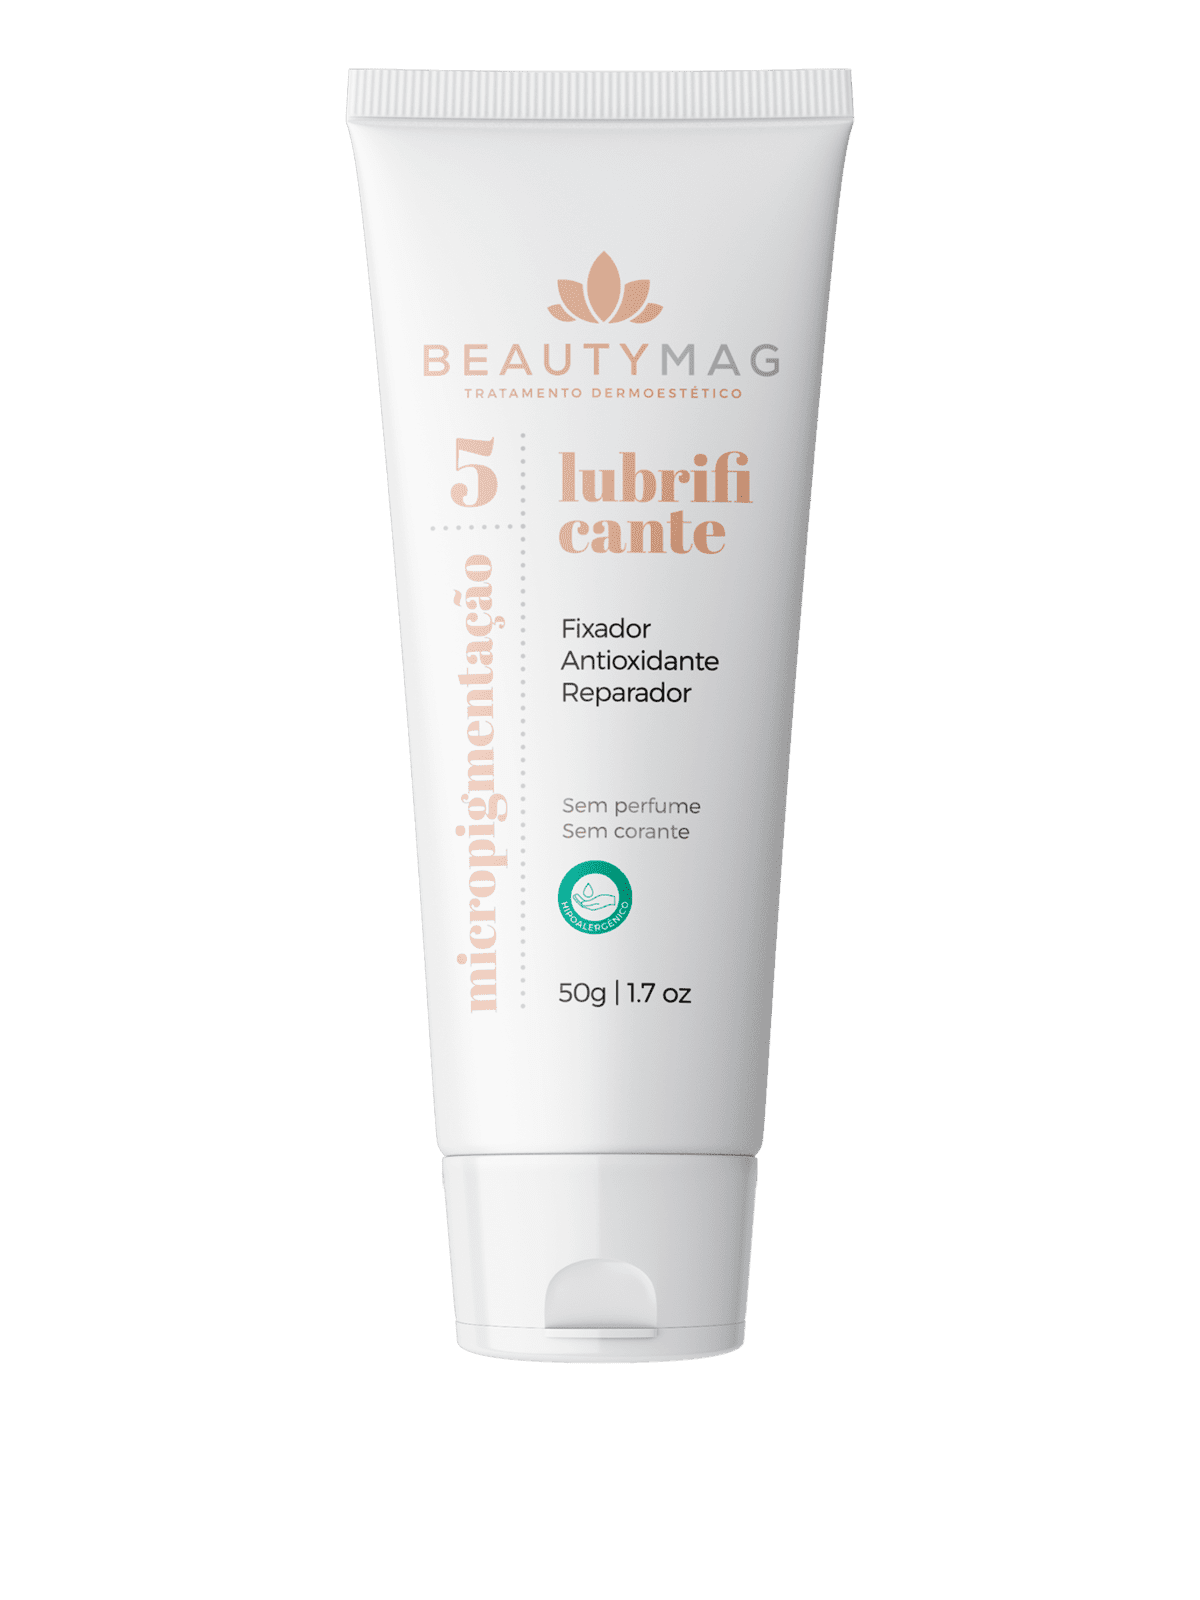 Lubrificante Beauty Mag Care - 50g  - Tebori Nordeste